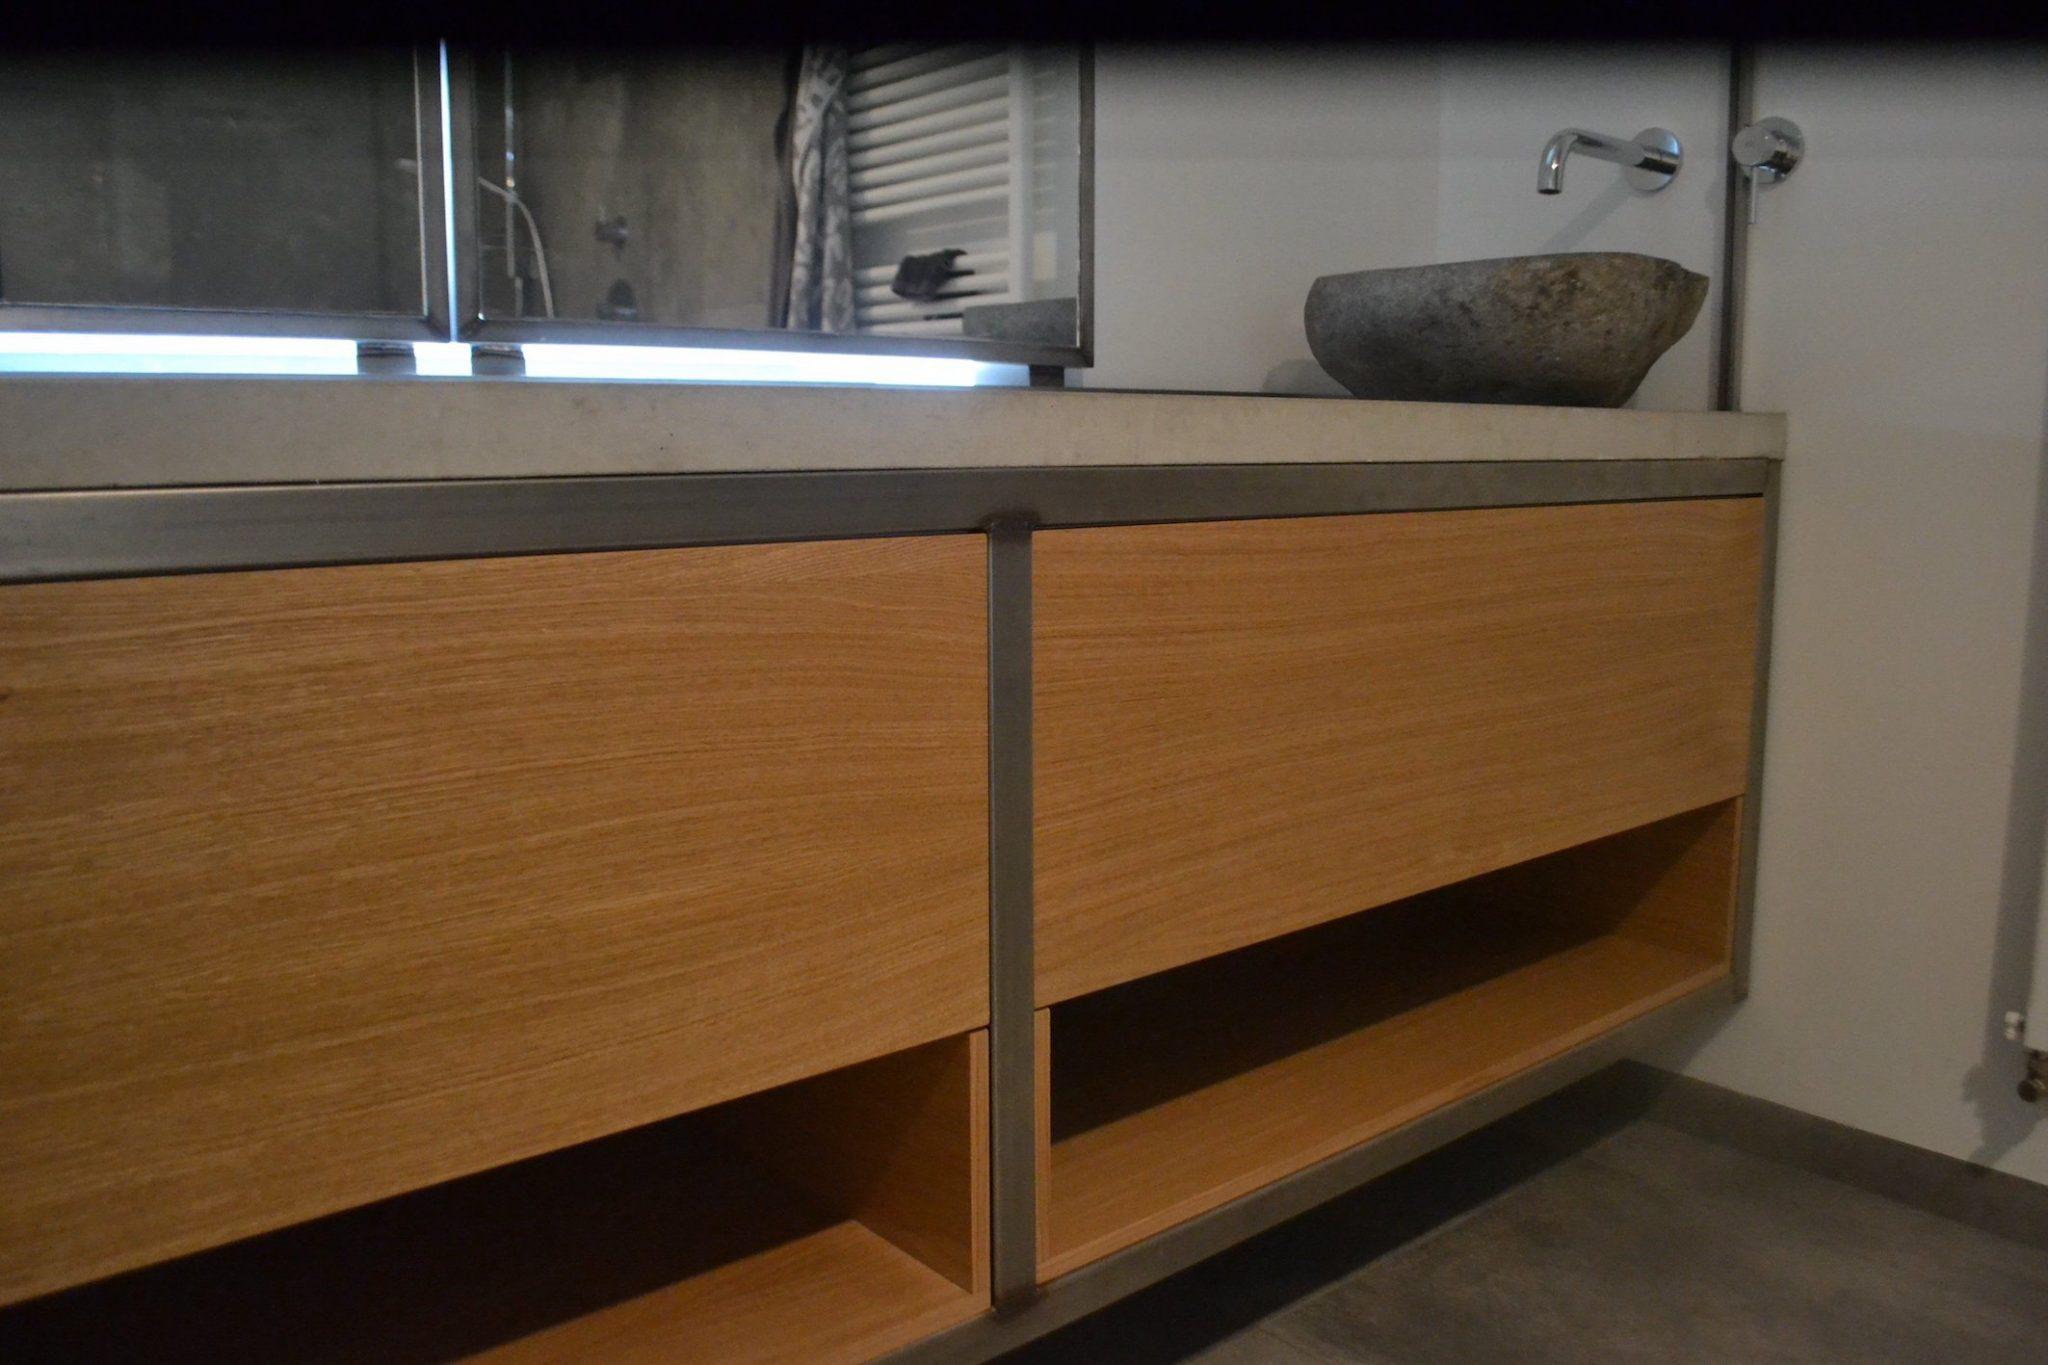 Houtwerff interieurbouw · badkamermeubel van hout en staal